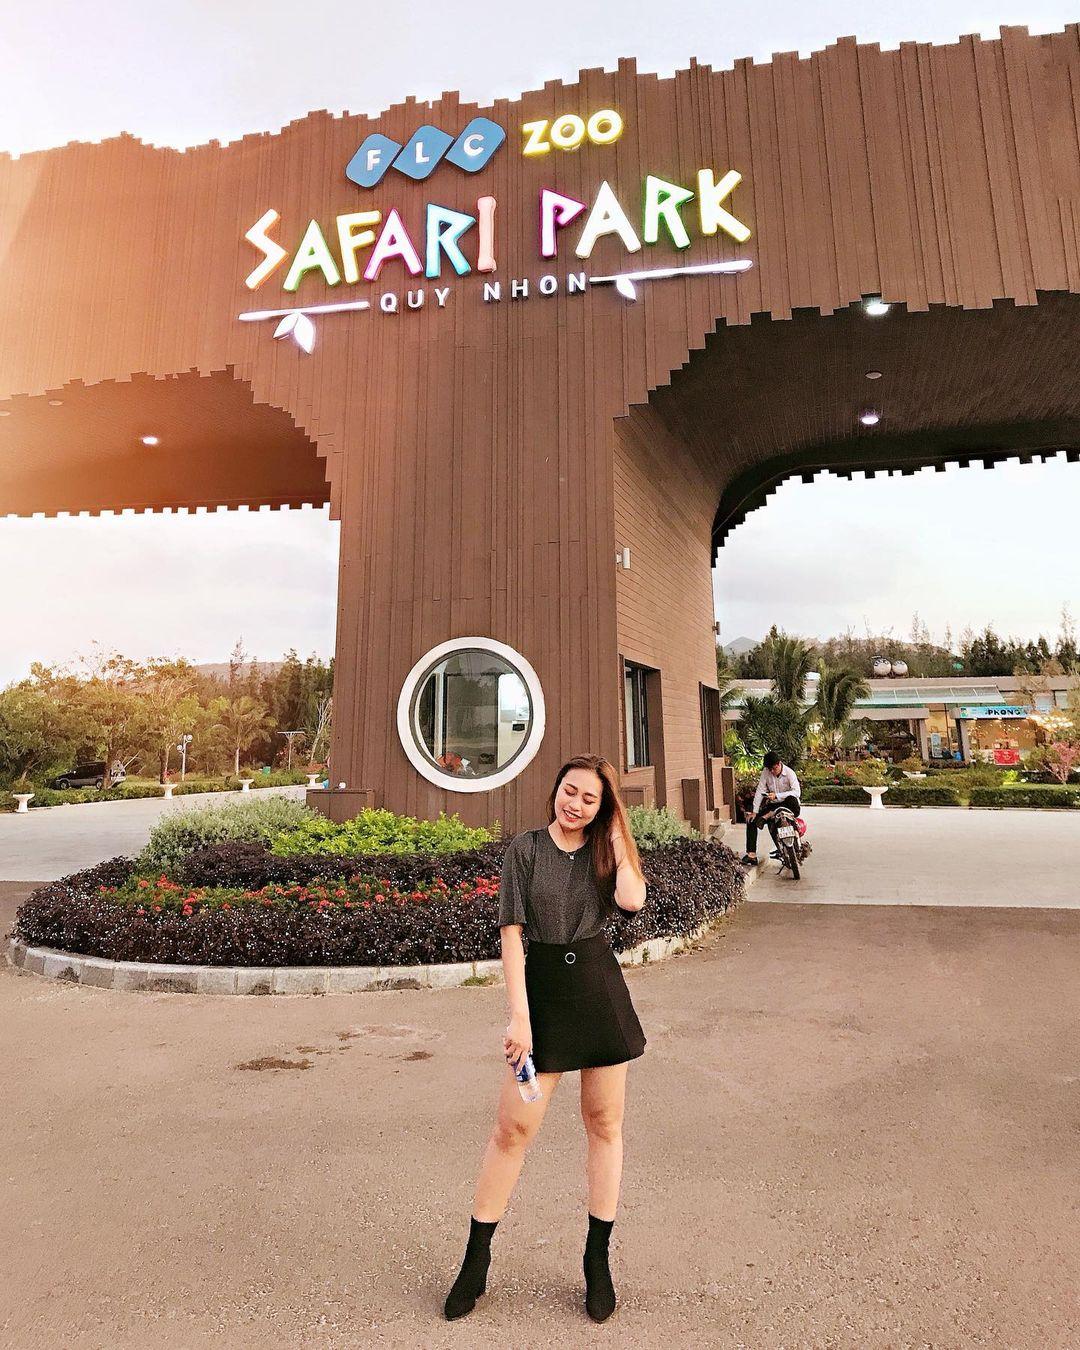 FLC Zoo Safari Park. Hình: @coconut2895